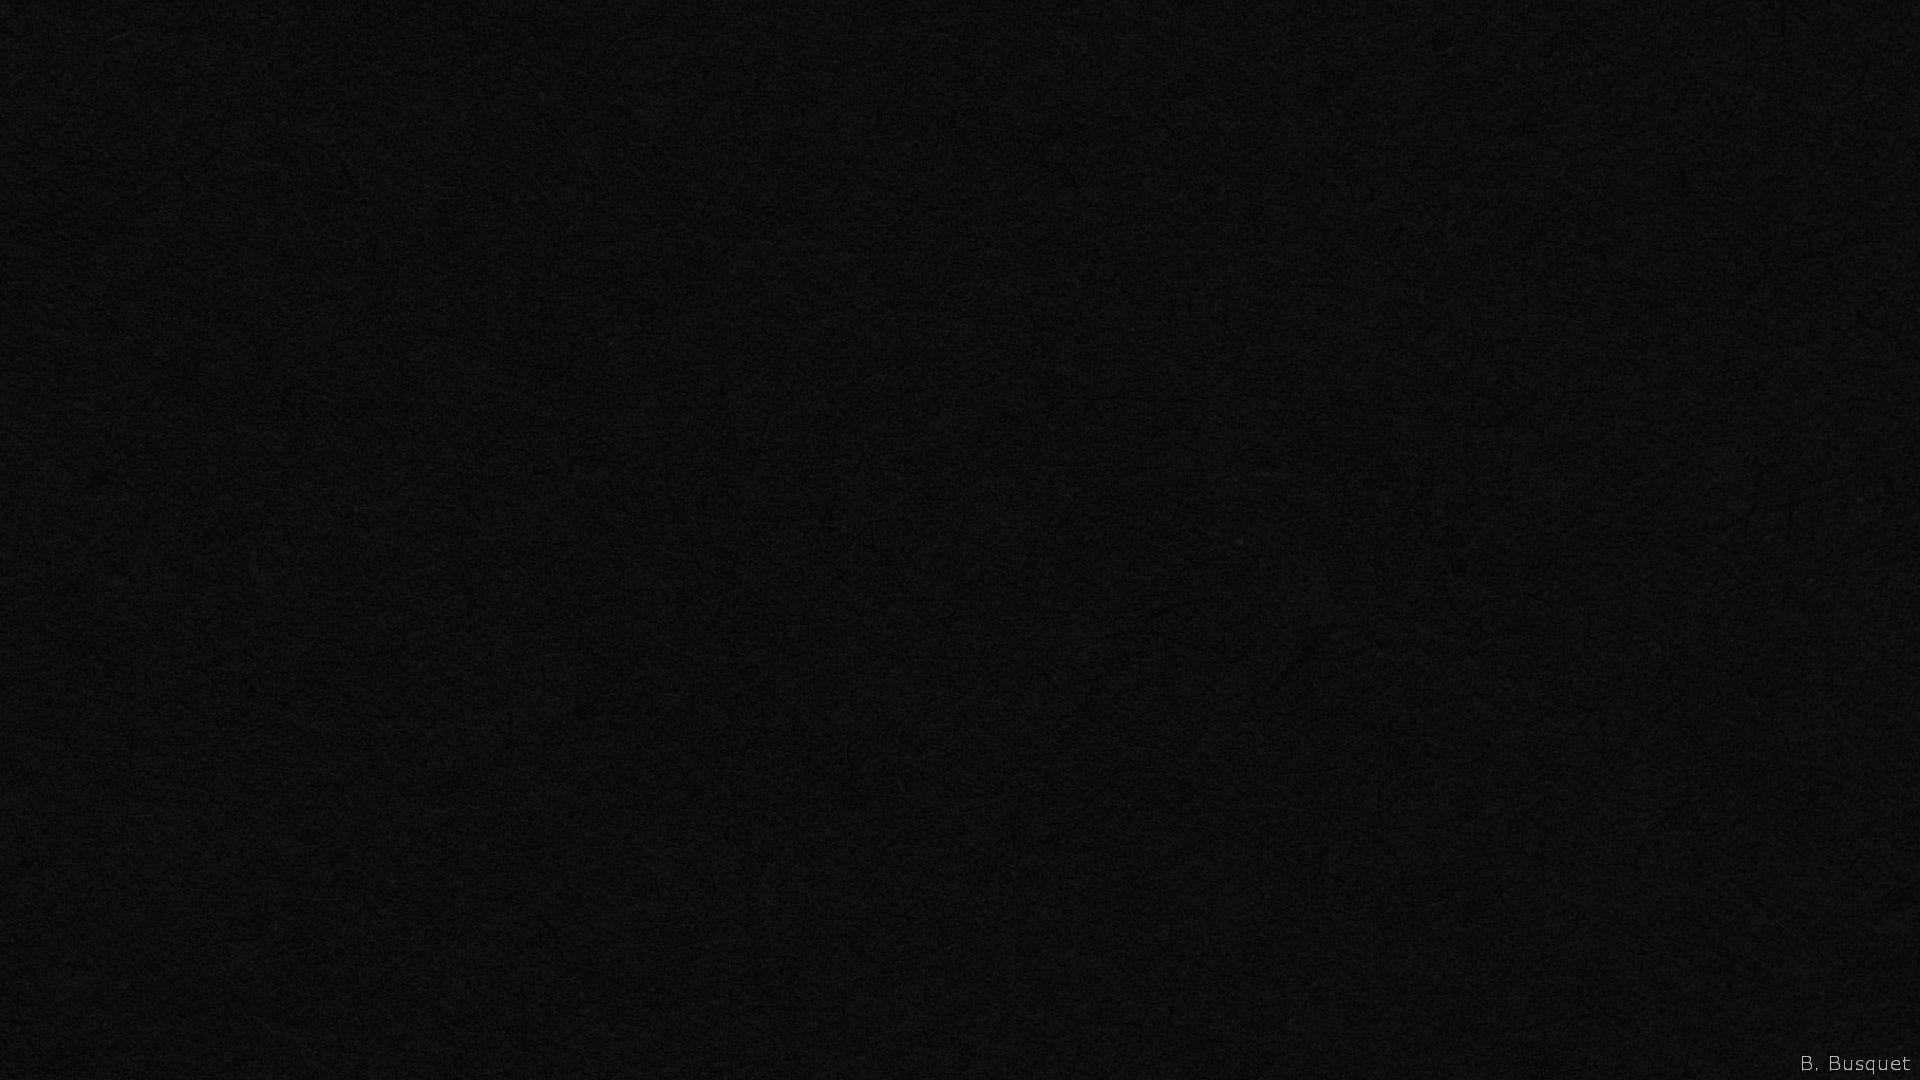 59 Dark Desktop Background On Wallpapersafari